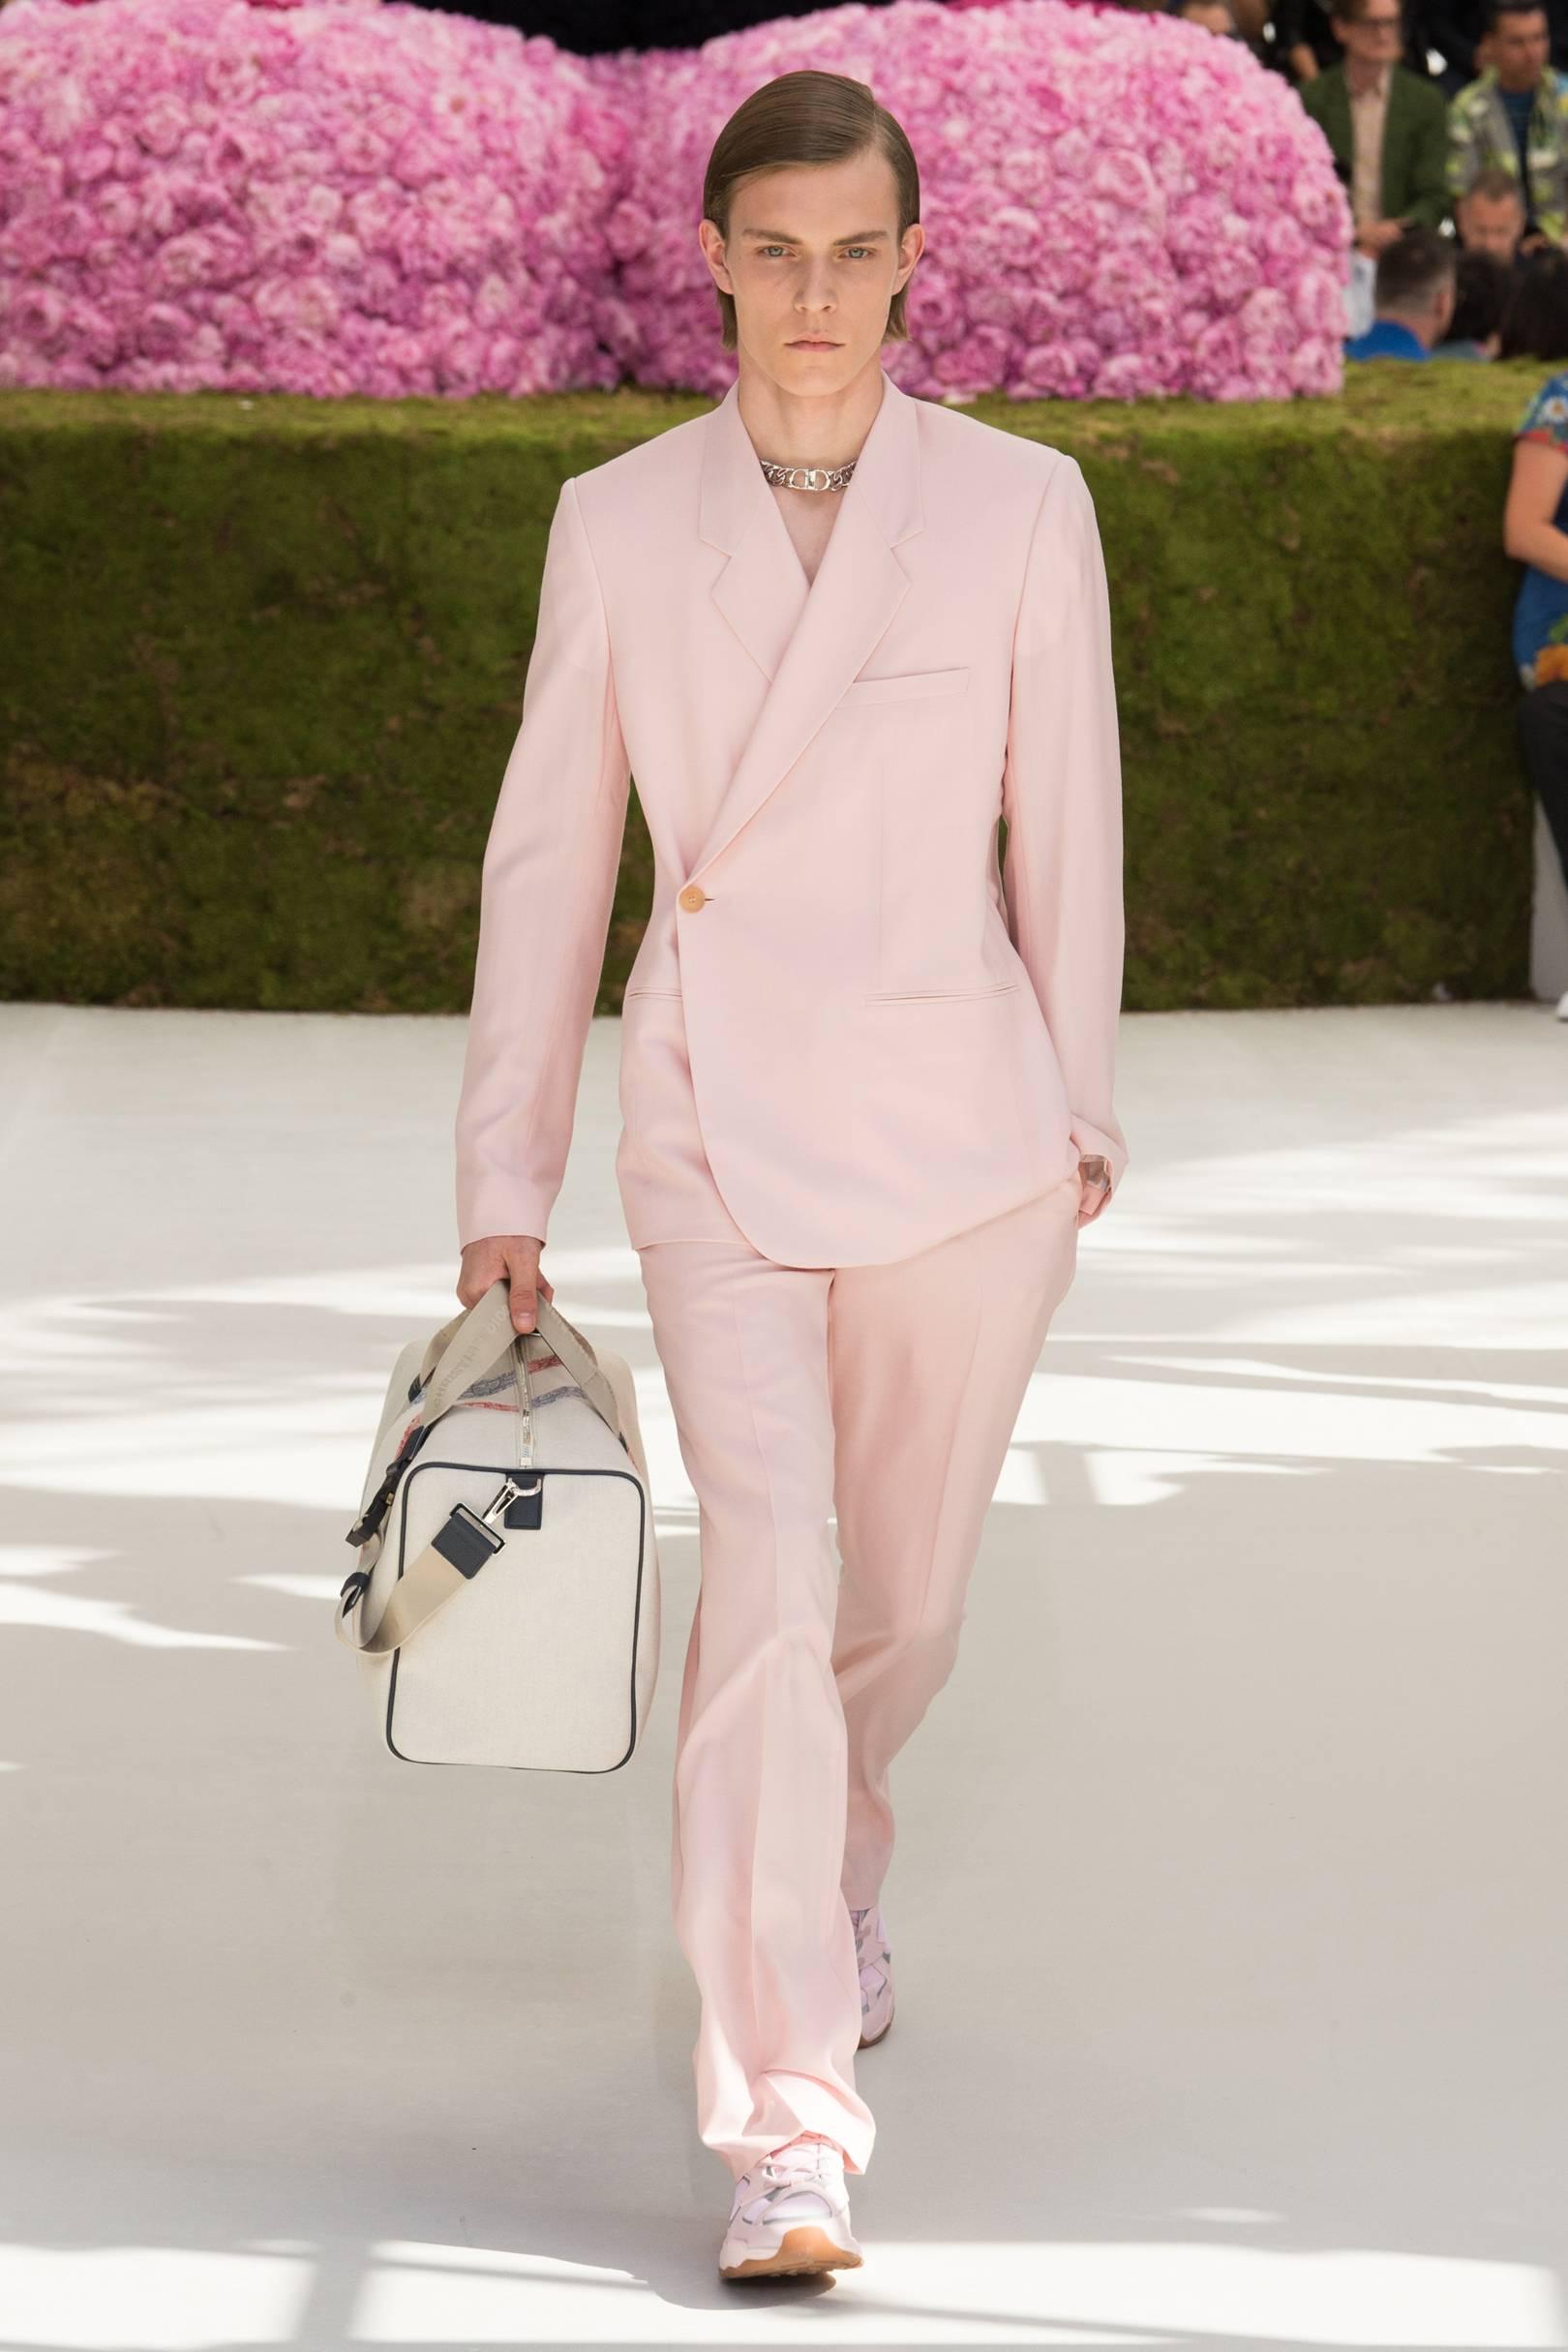 d170f4c32 Kim Jones interview: the new artistic director on his tenure at Dior |  British GQ